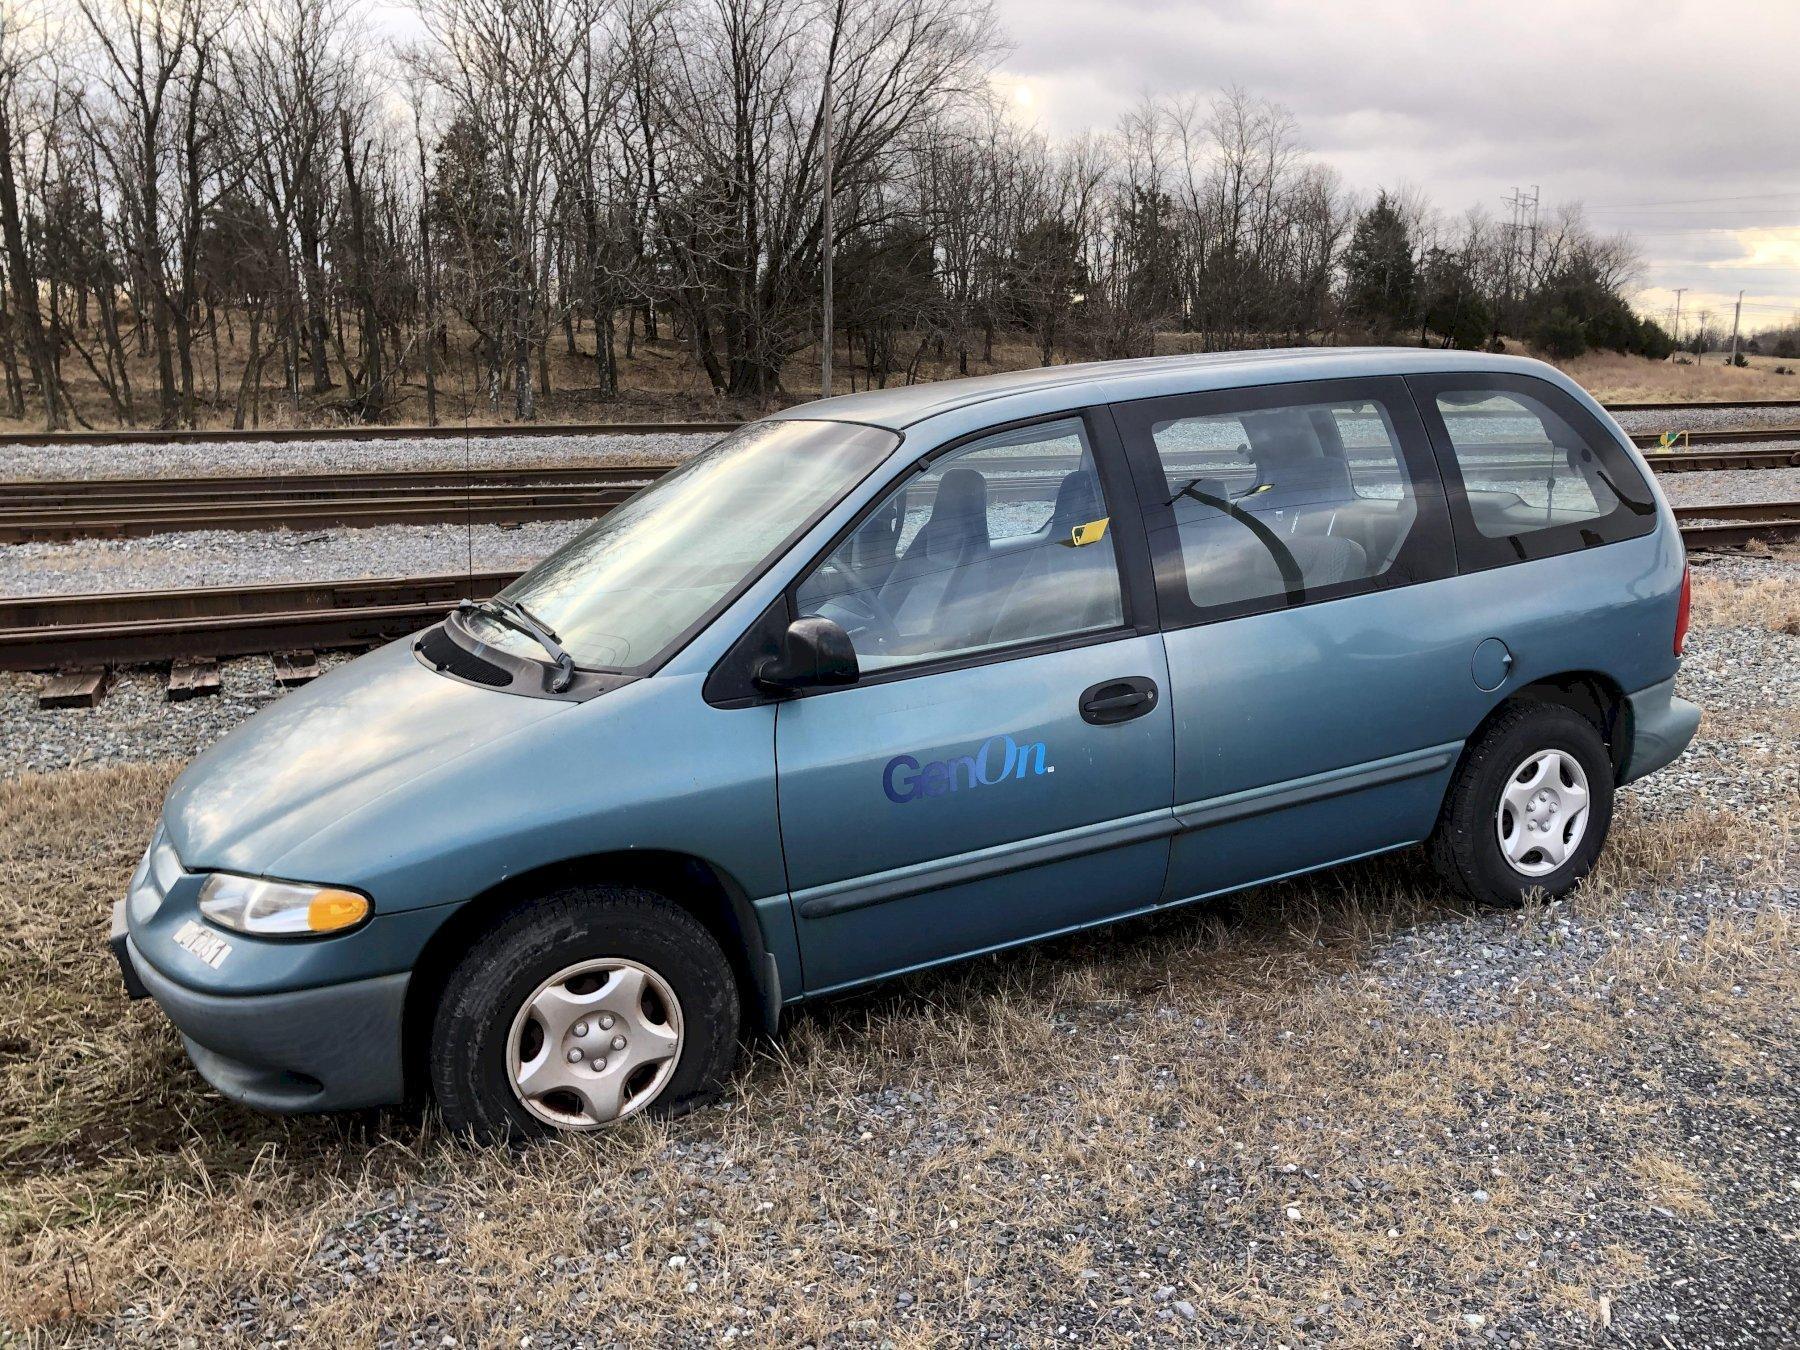 1999 Dodge Caravan vin# 2b4p25b2xr473441